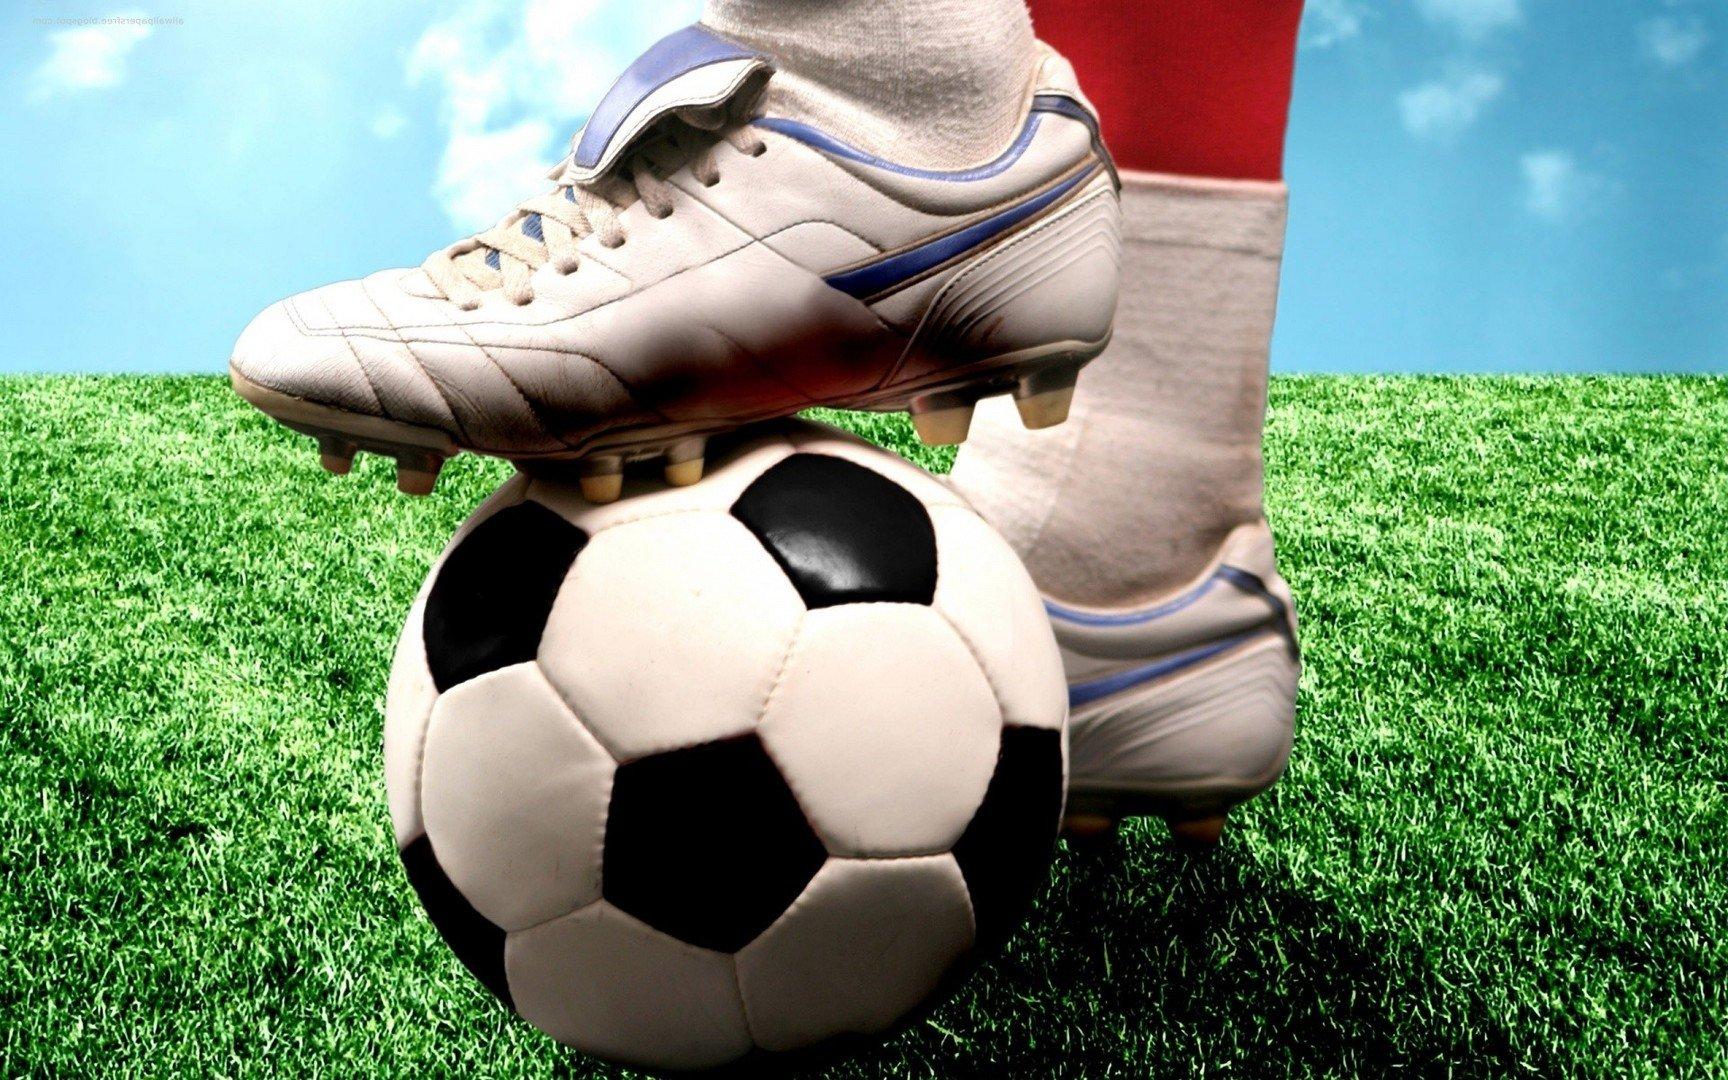 Download Wallpaper Sport Football: [45+] Football HD Wallpapers 1080p On WallpaperSafari